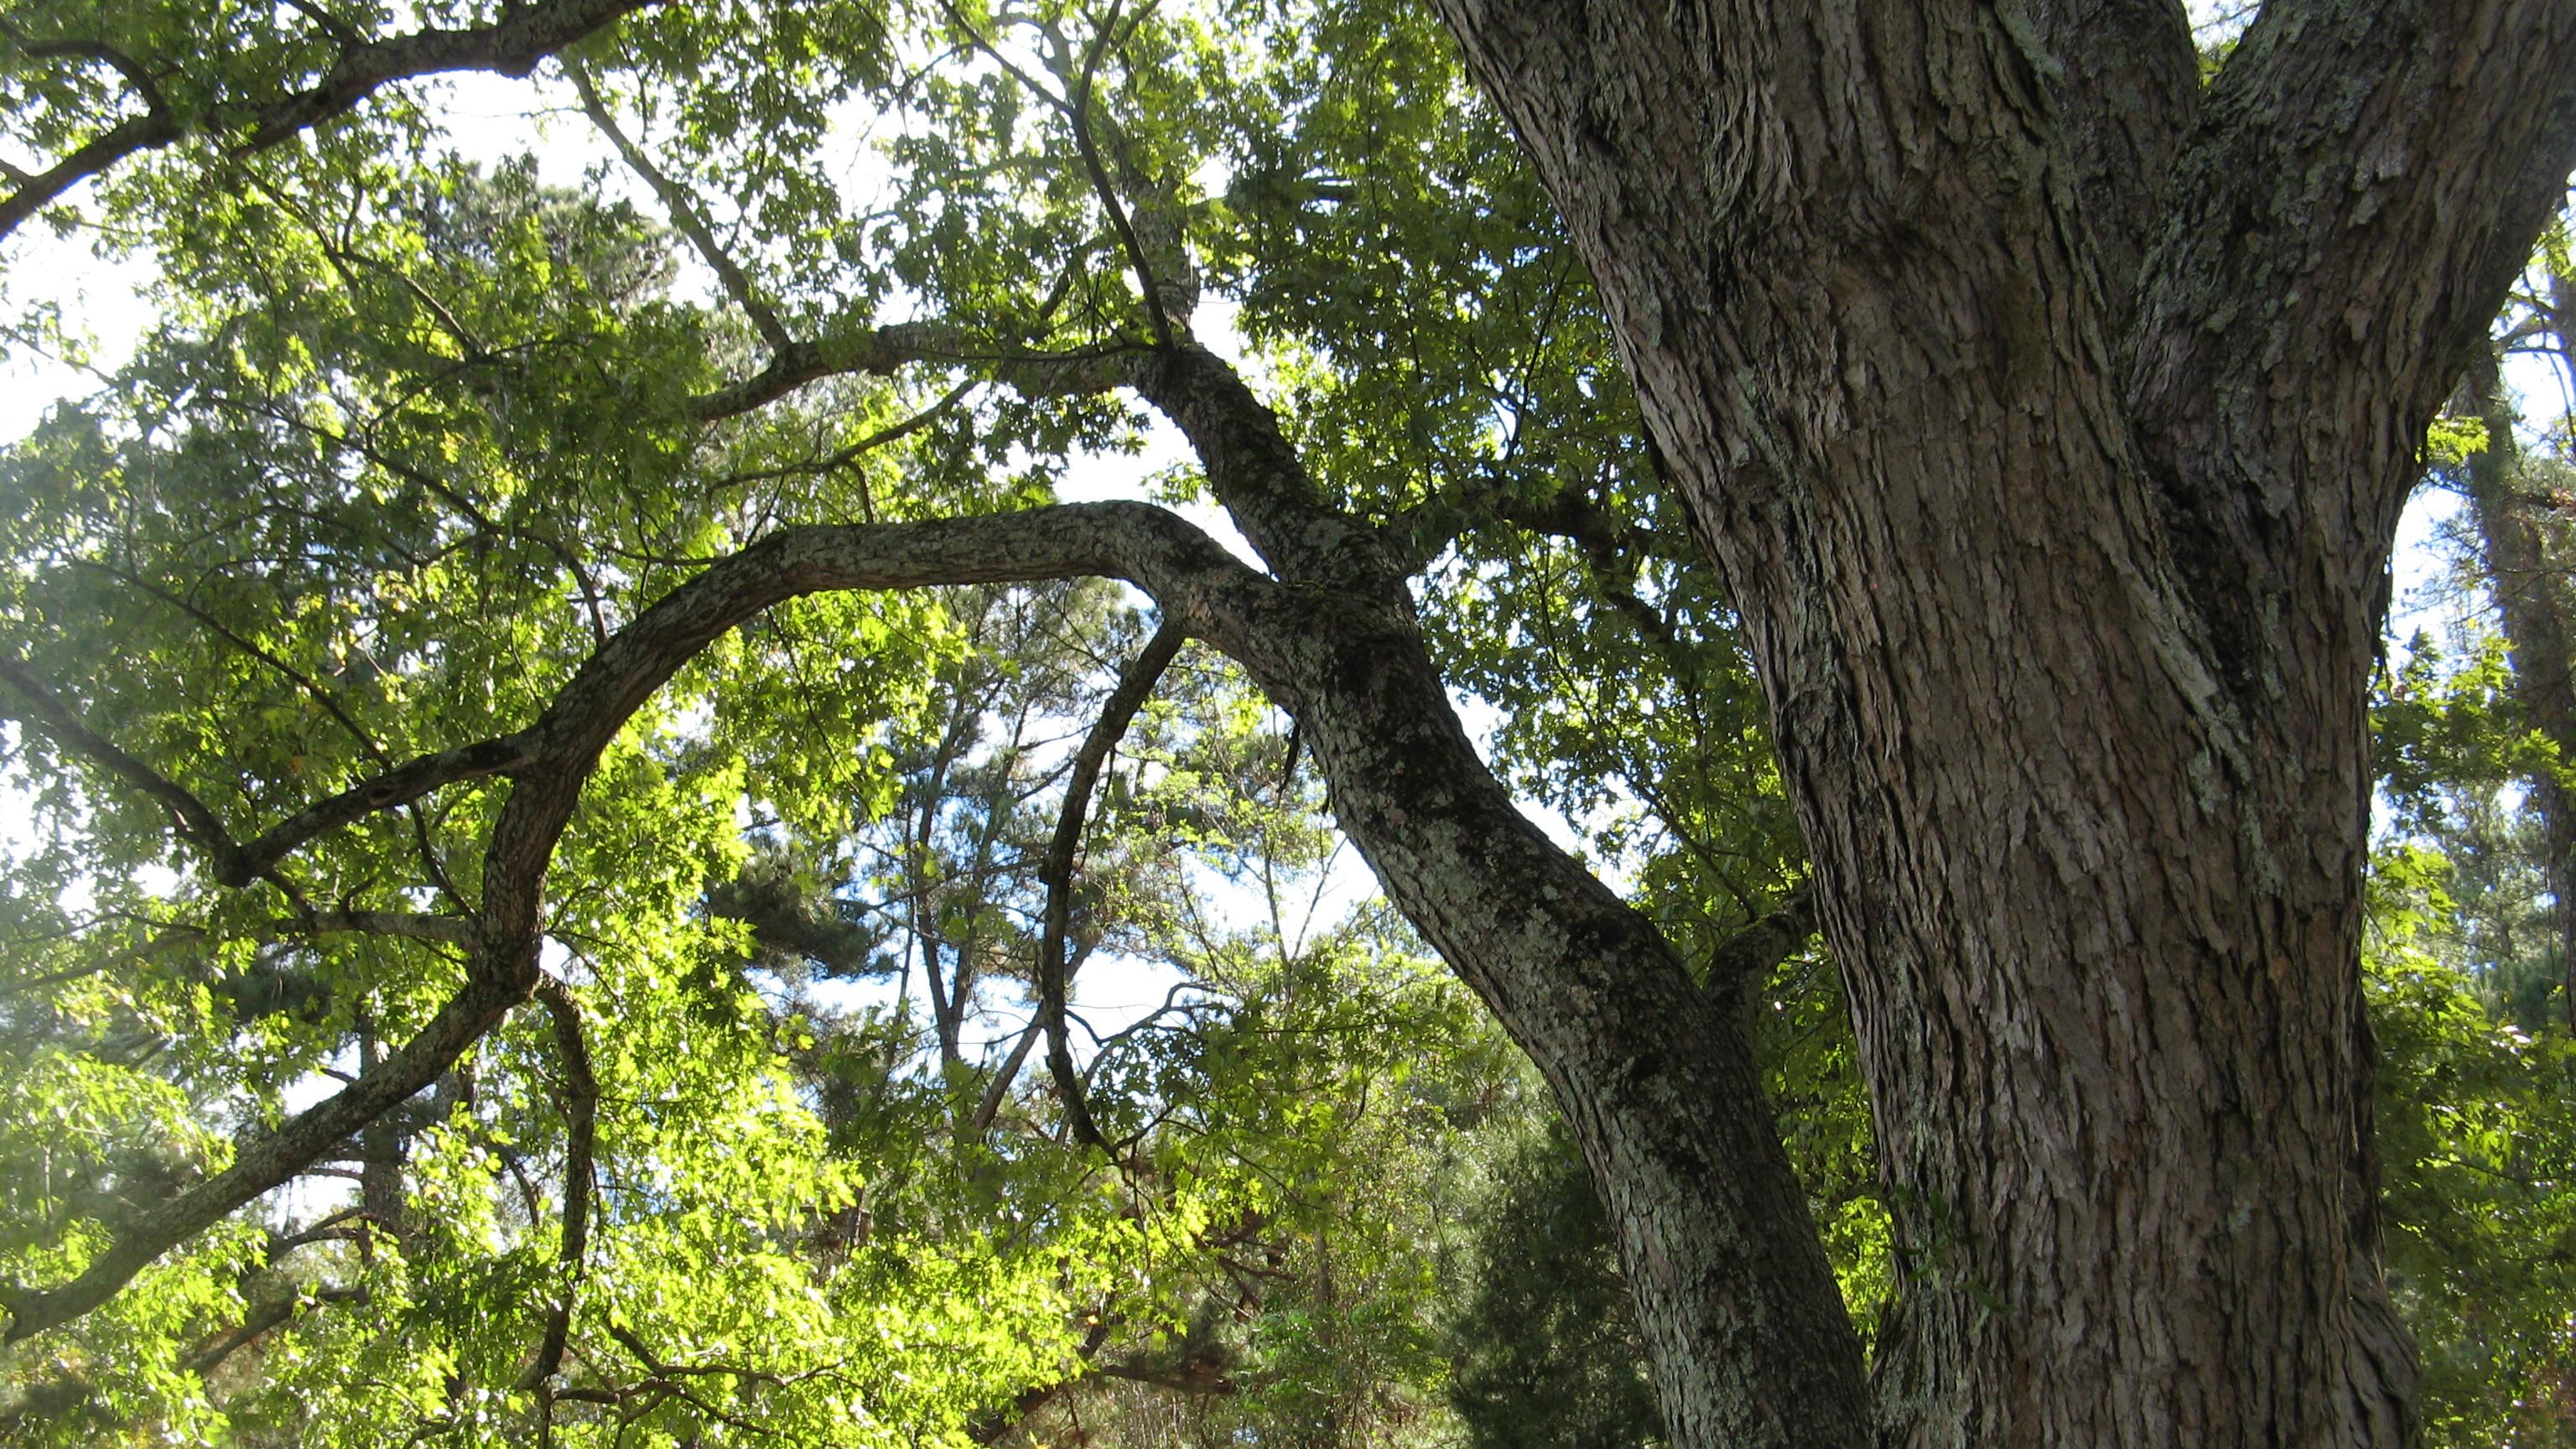 Upcoming Georgia Tree Council Educational Programs